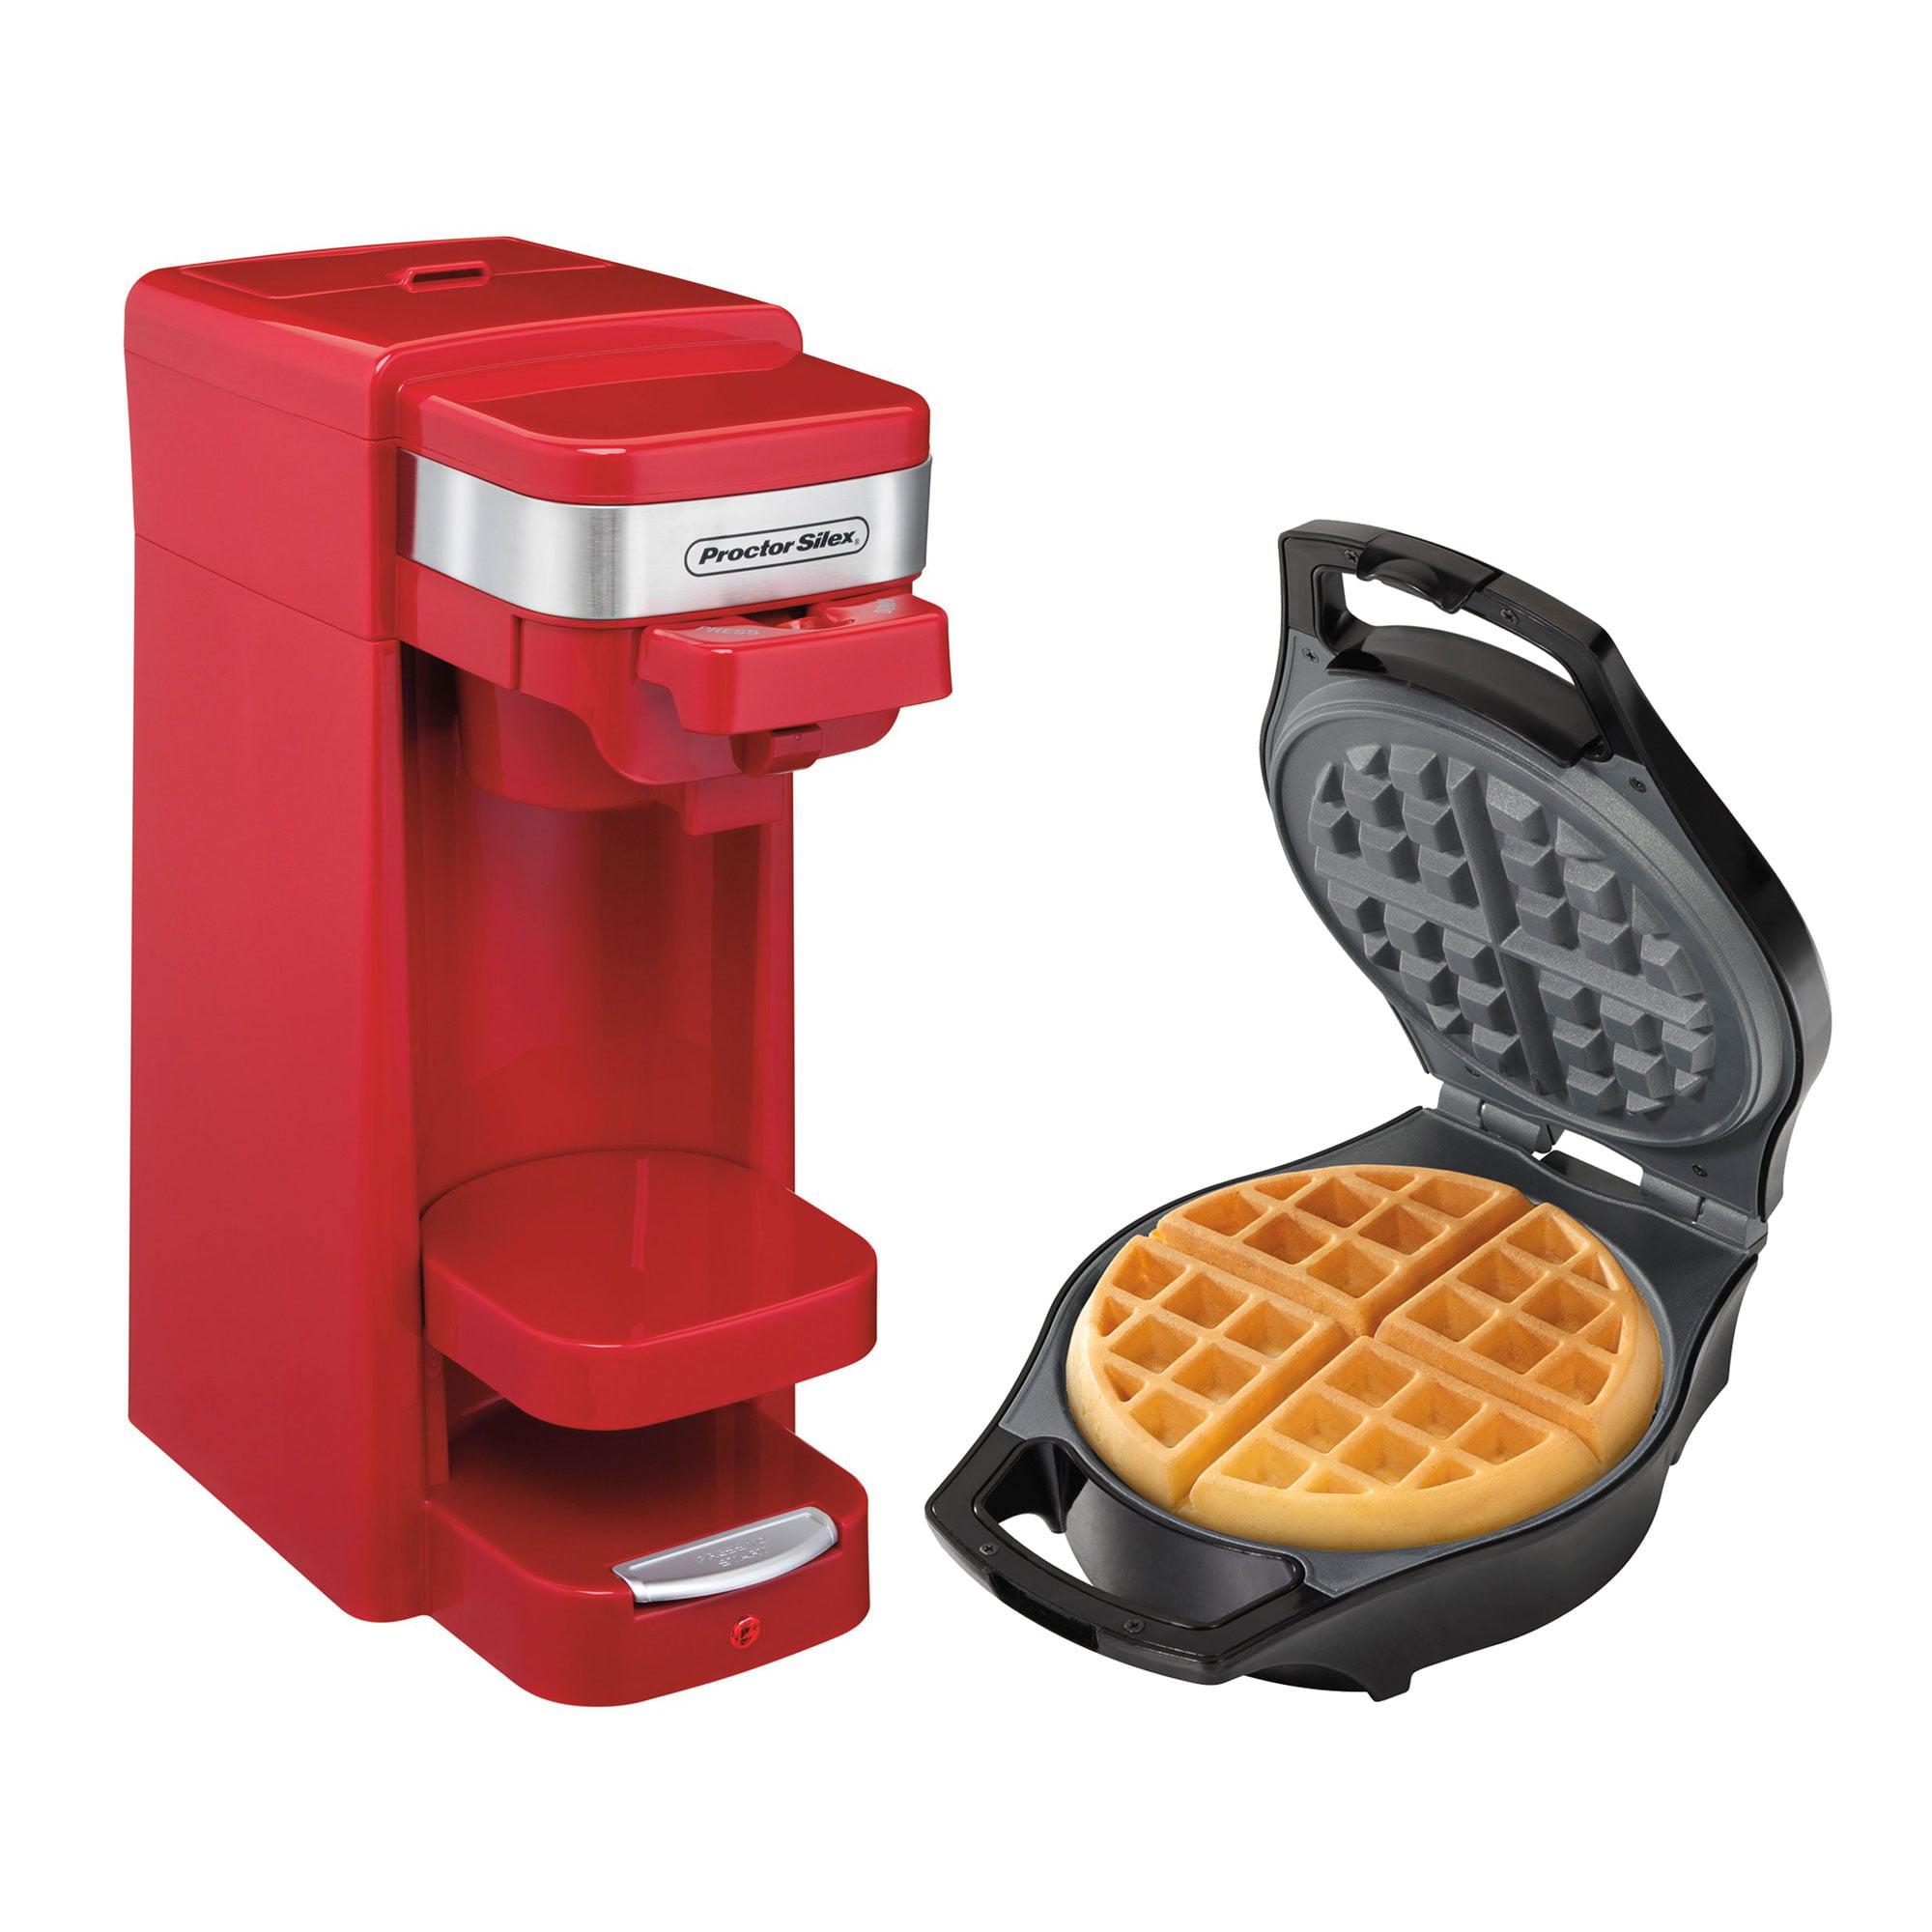 Proctor Silex FlexBrew Single Serve Ground Coffee Maker w/ Belgian Waffle Maker